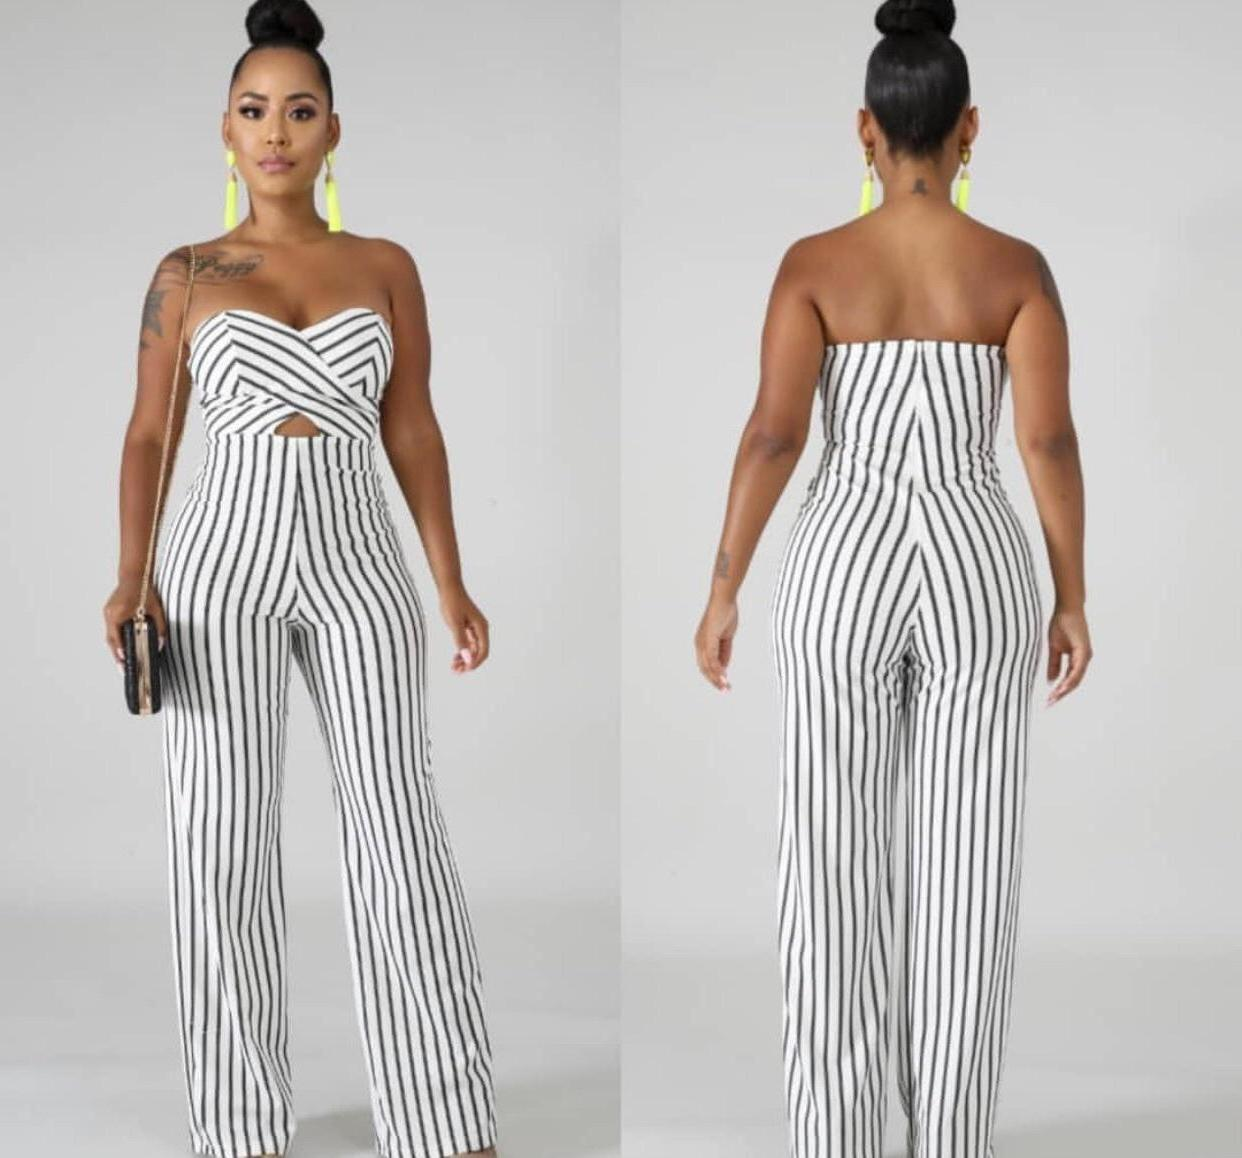 Jumpsuit Stripes Jumpsuit Romper Stripes Shoulder Trendy cover image